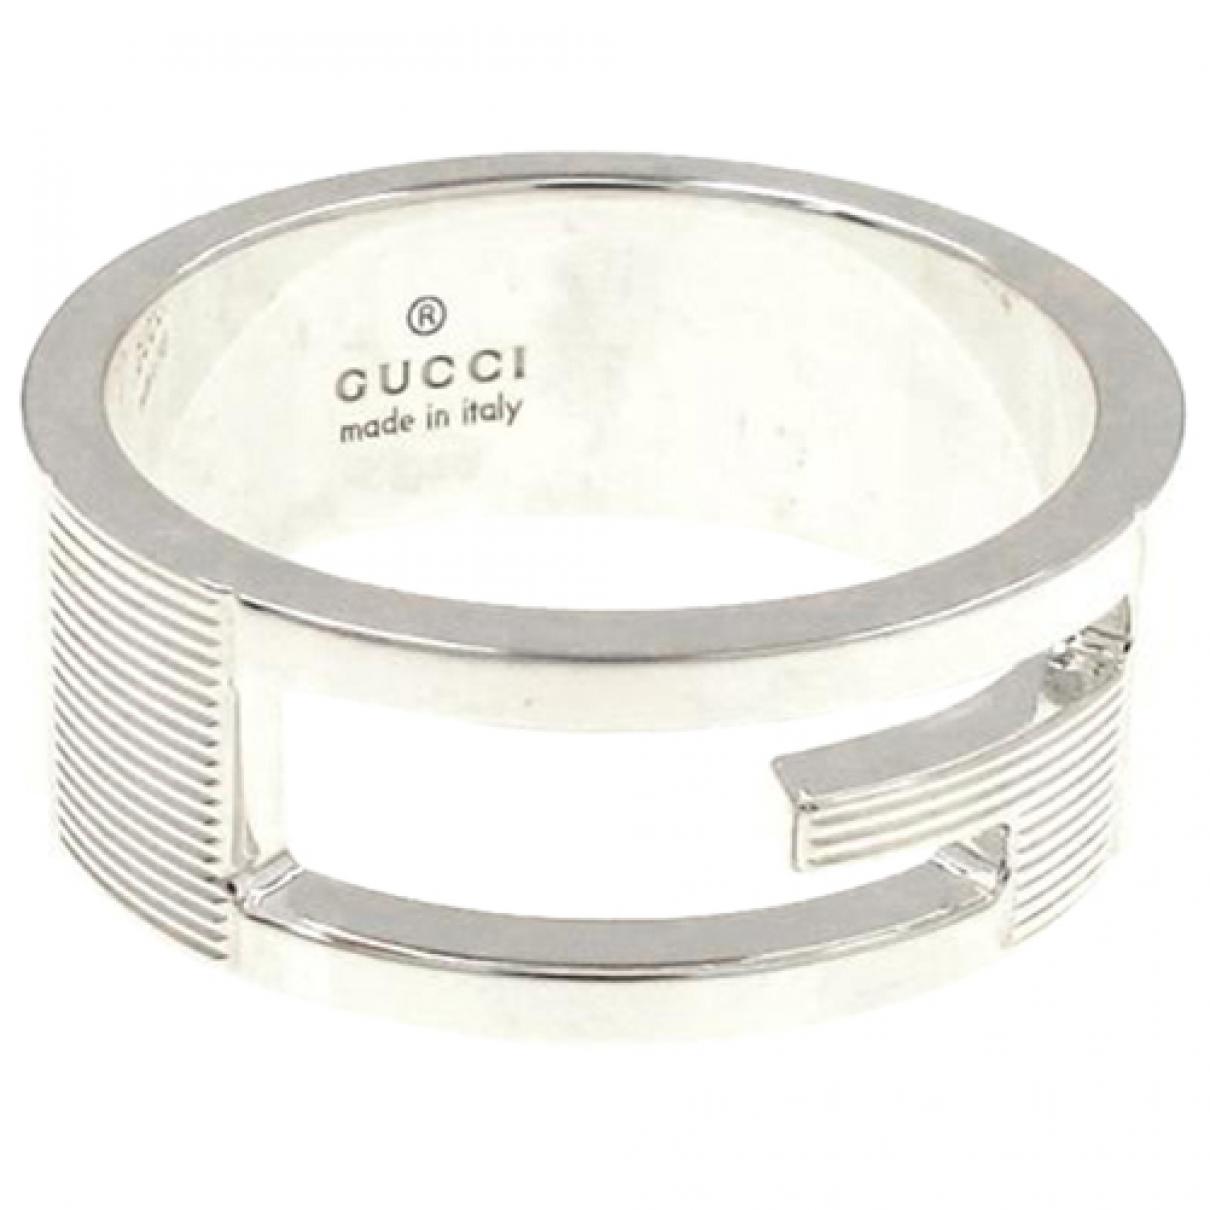 Gucci N Silver Silver ring for Women 58 EU